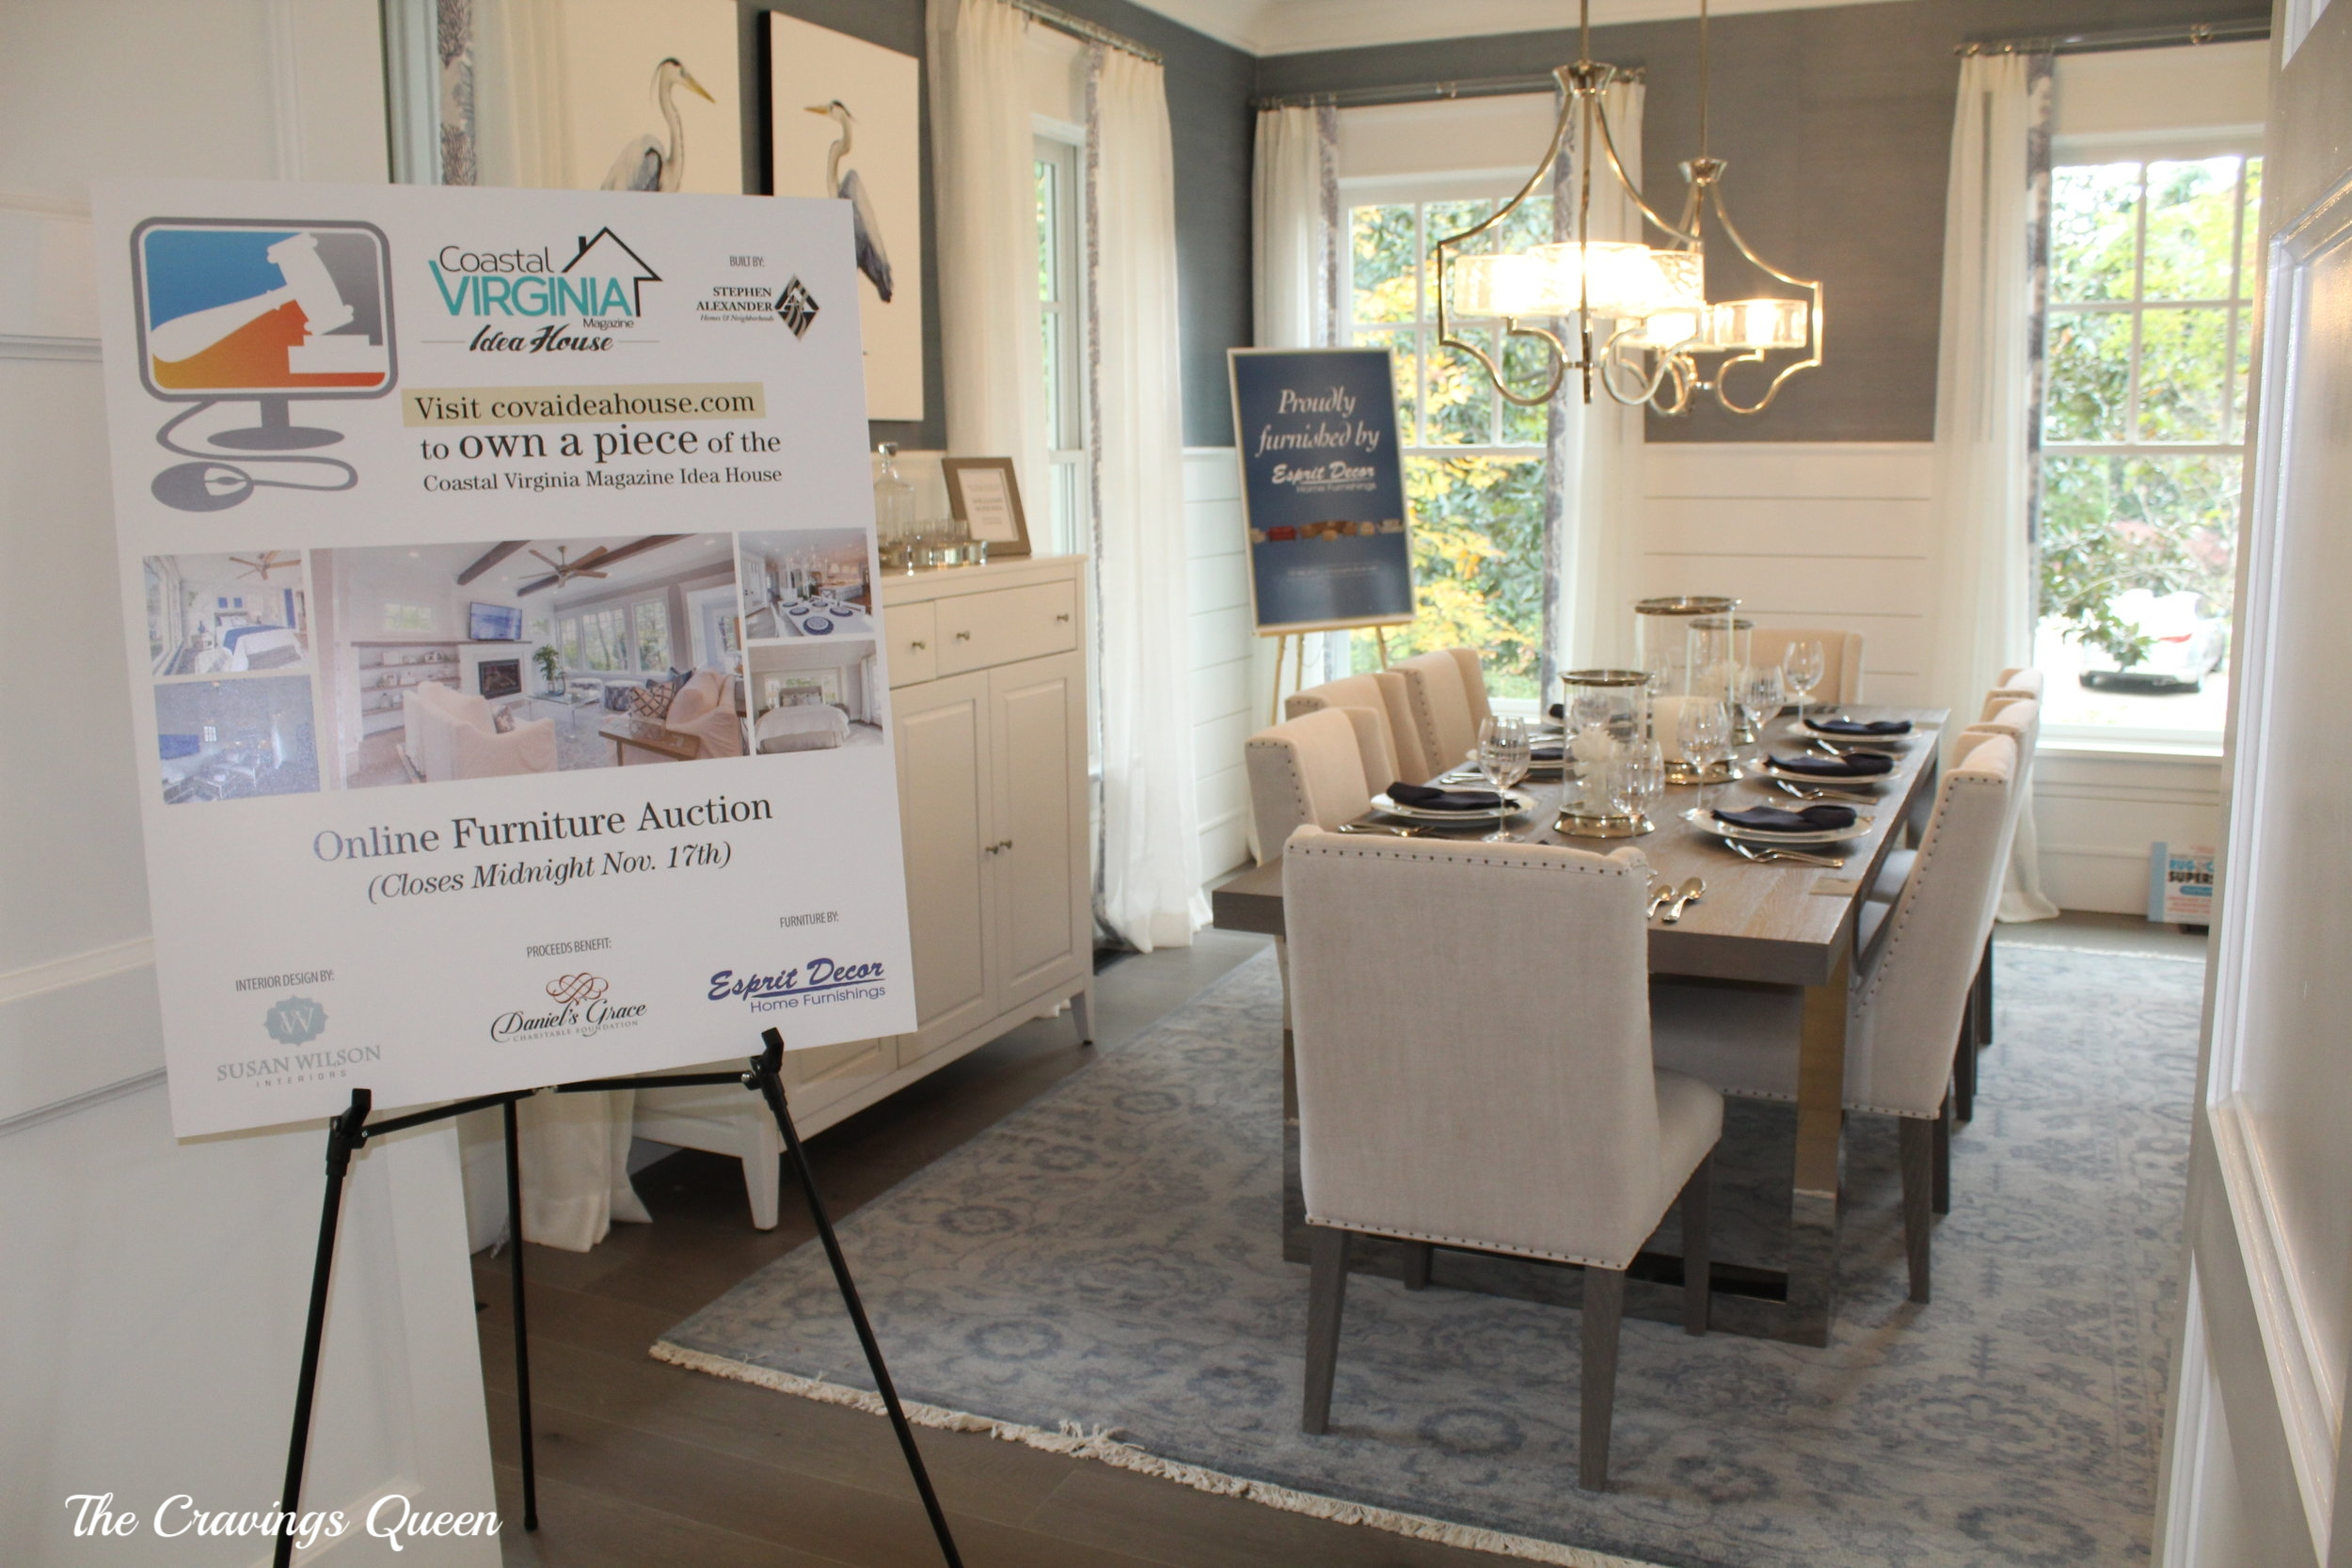 CoVa-Idea-House-dining-room.JPG